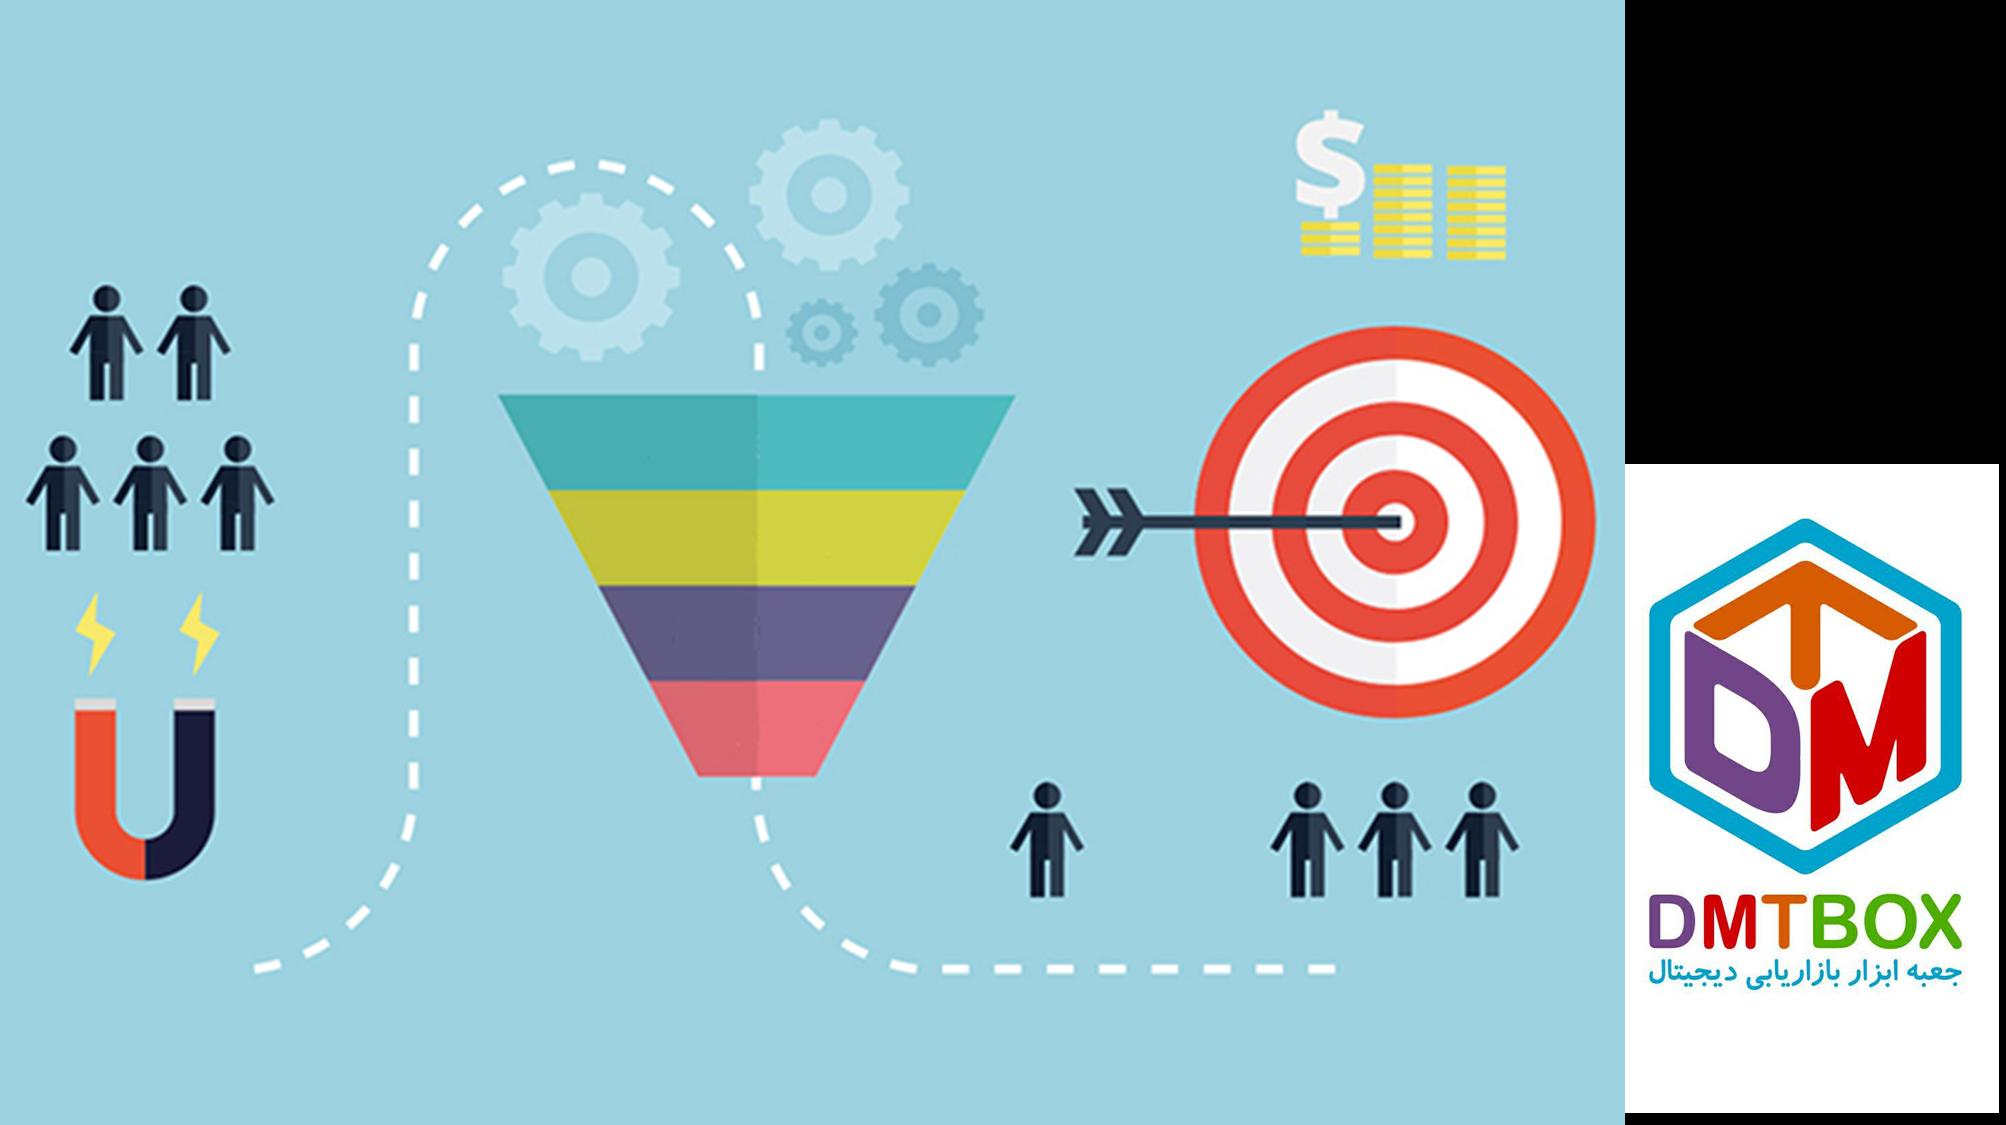 ایجاد سرنخ بازاریابی و فروش